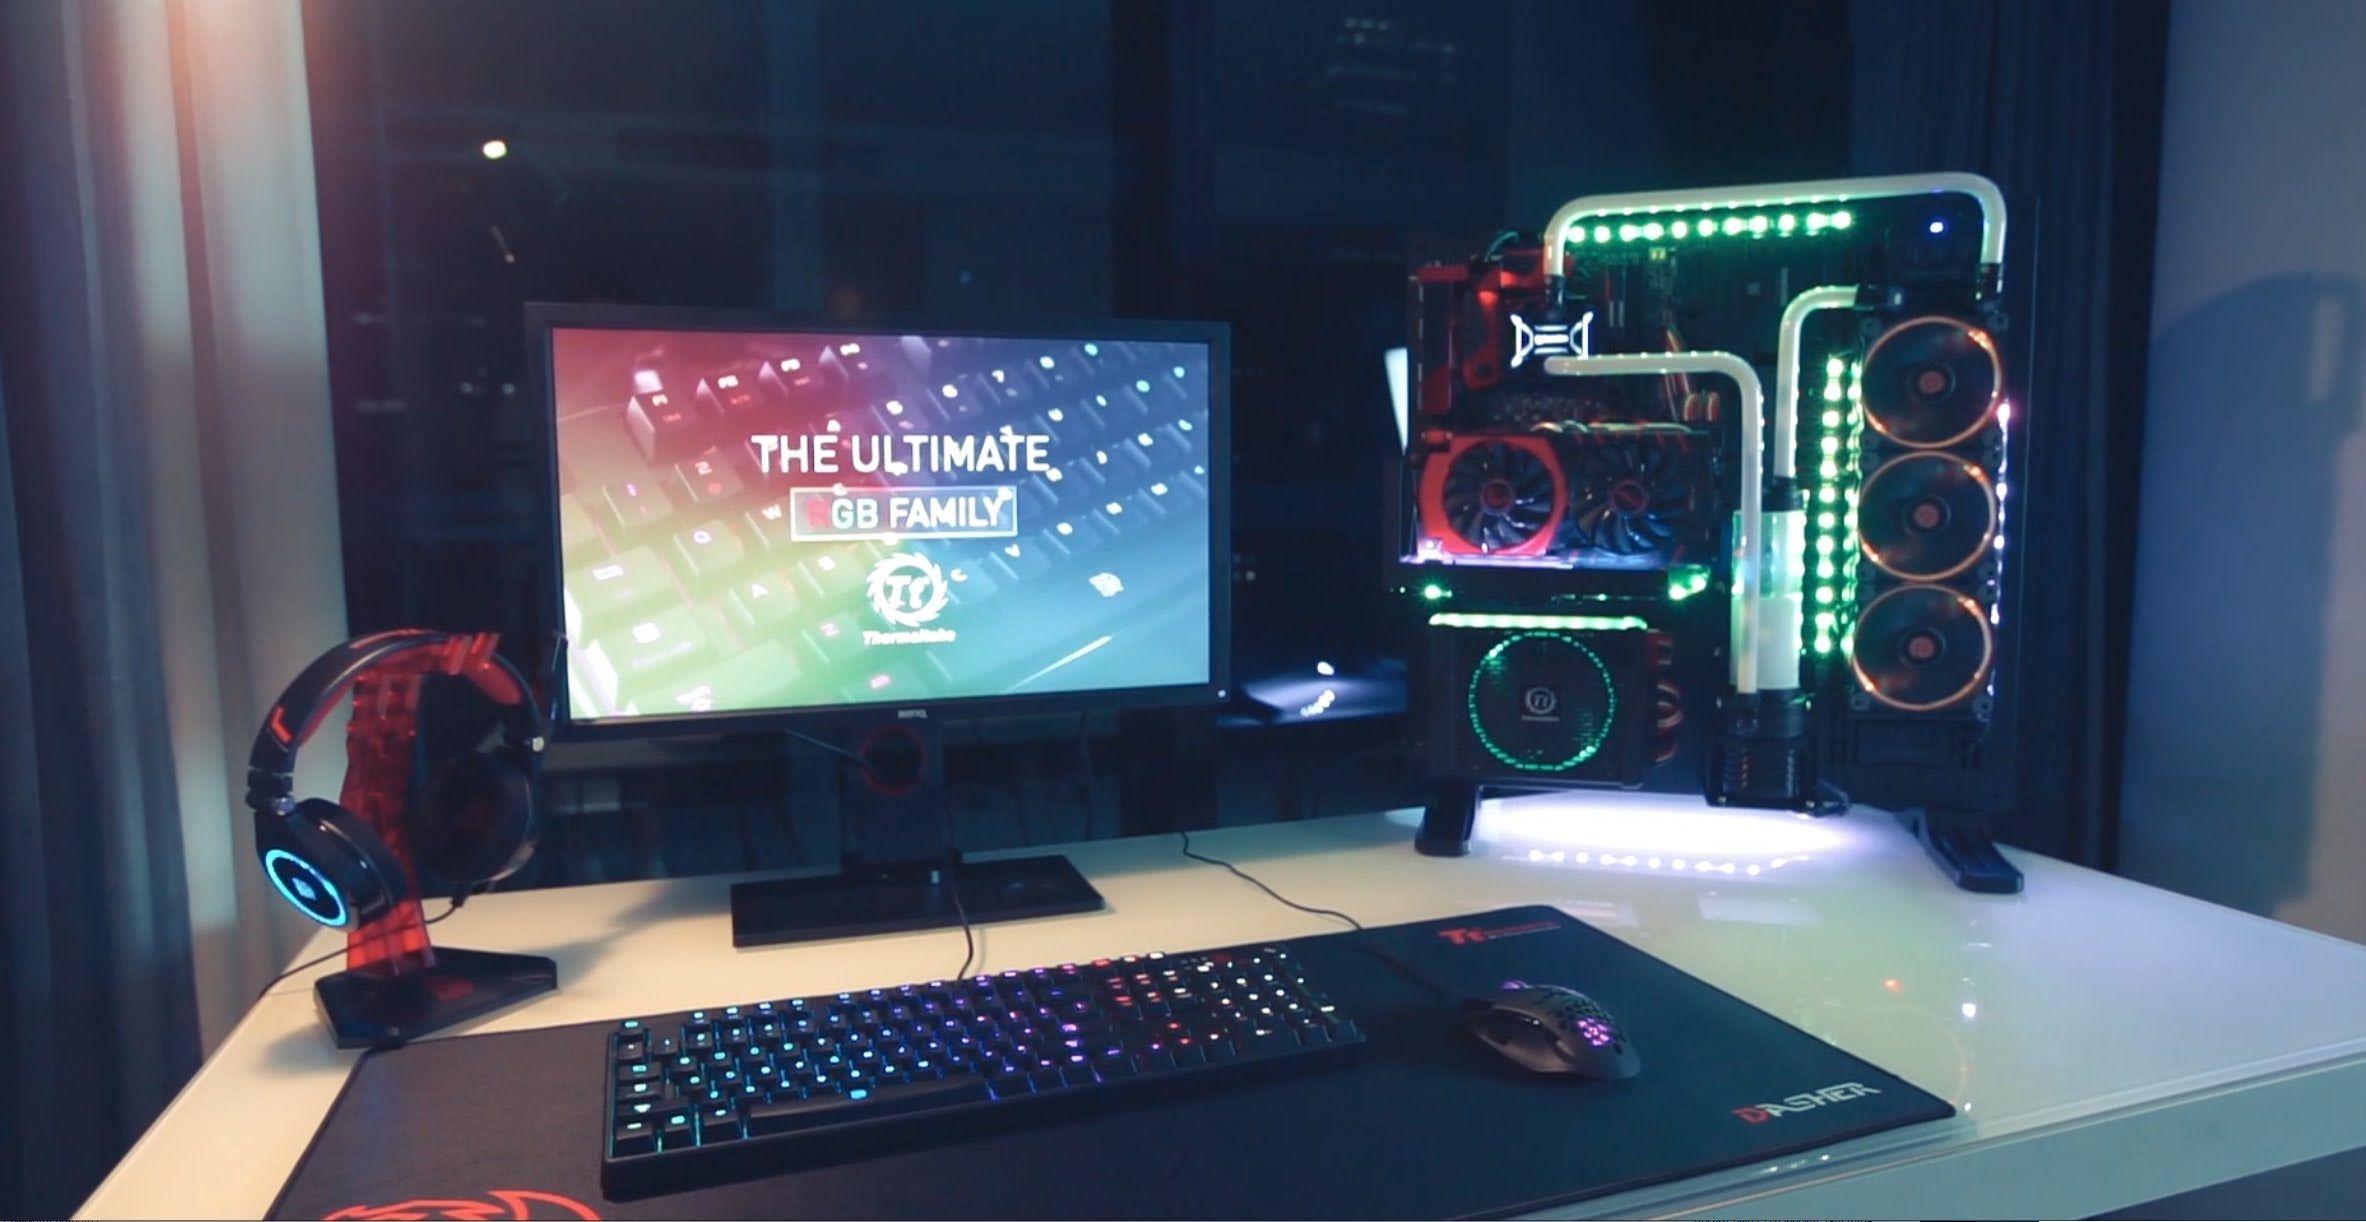 My ultimate gaming setup man cave bedroom june 2014 youtube - Thermaltake Rgb Family Full Thermaltake Rgb Core P5 Setup Give Away In Description